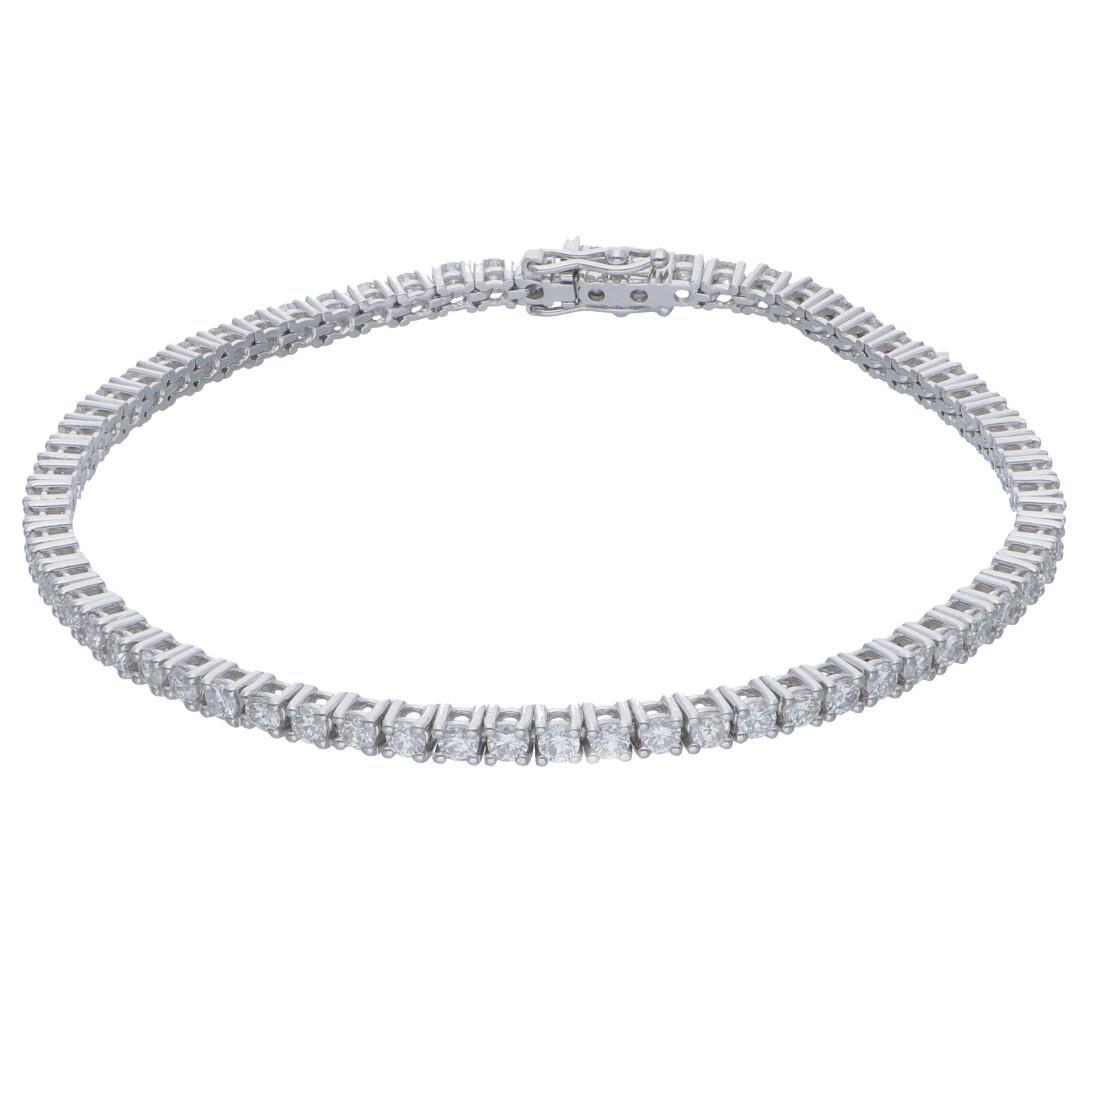 Tennis bracelet with diamonds ct 2,6 - ALFIERI & ST. JOHN